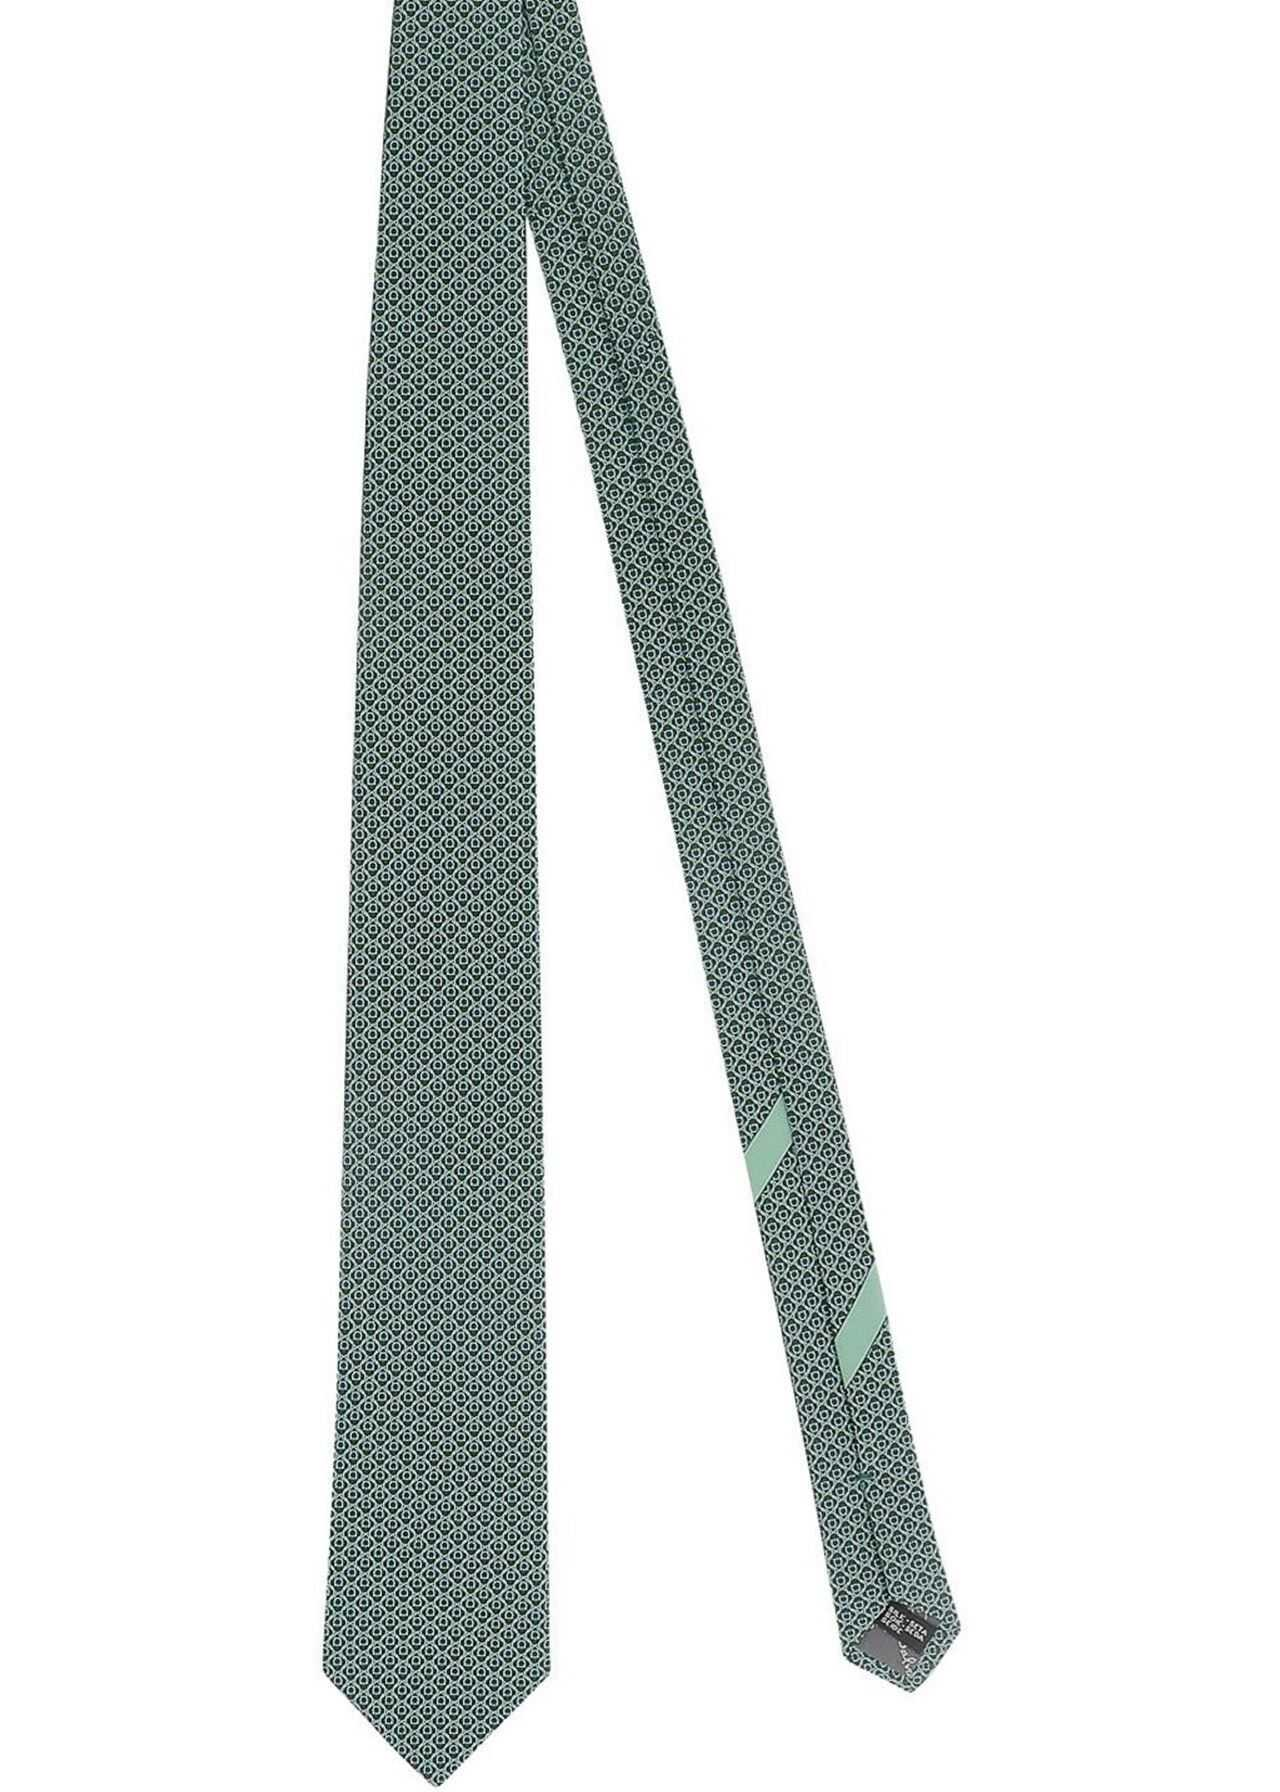 Salvatore Ferragamo Printed Silk Tie In Green Green